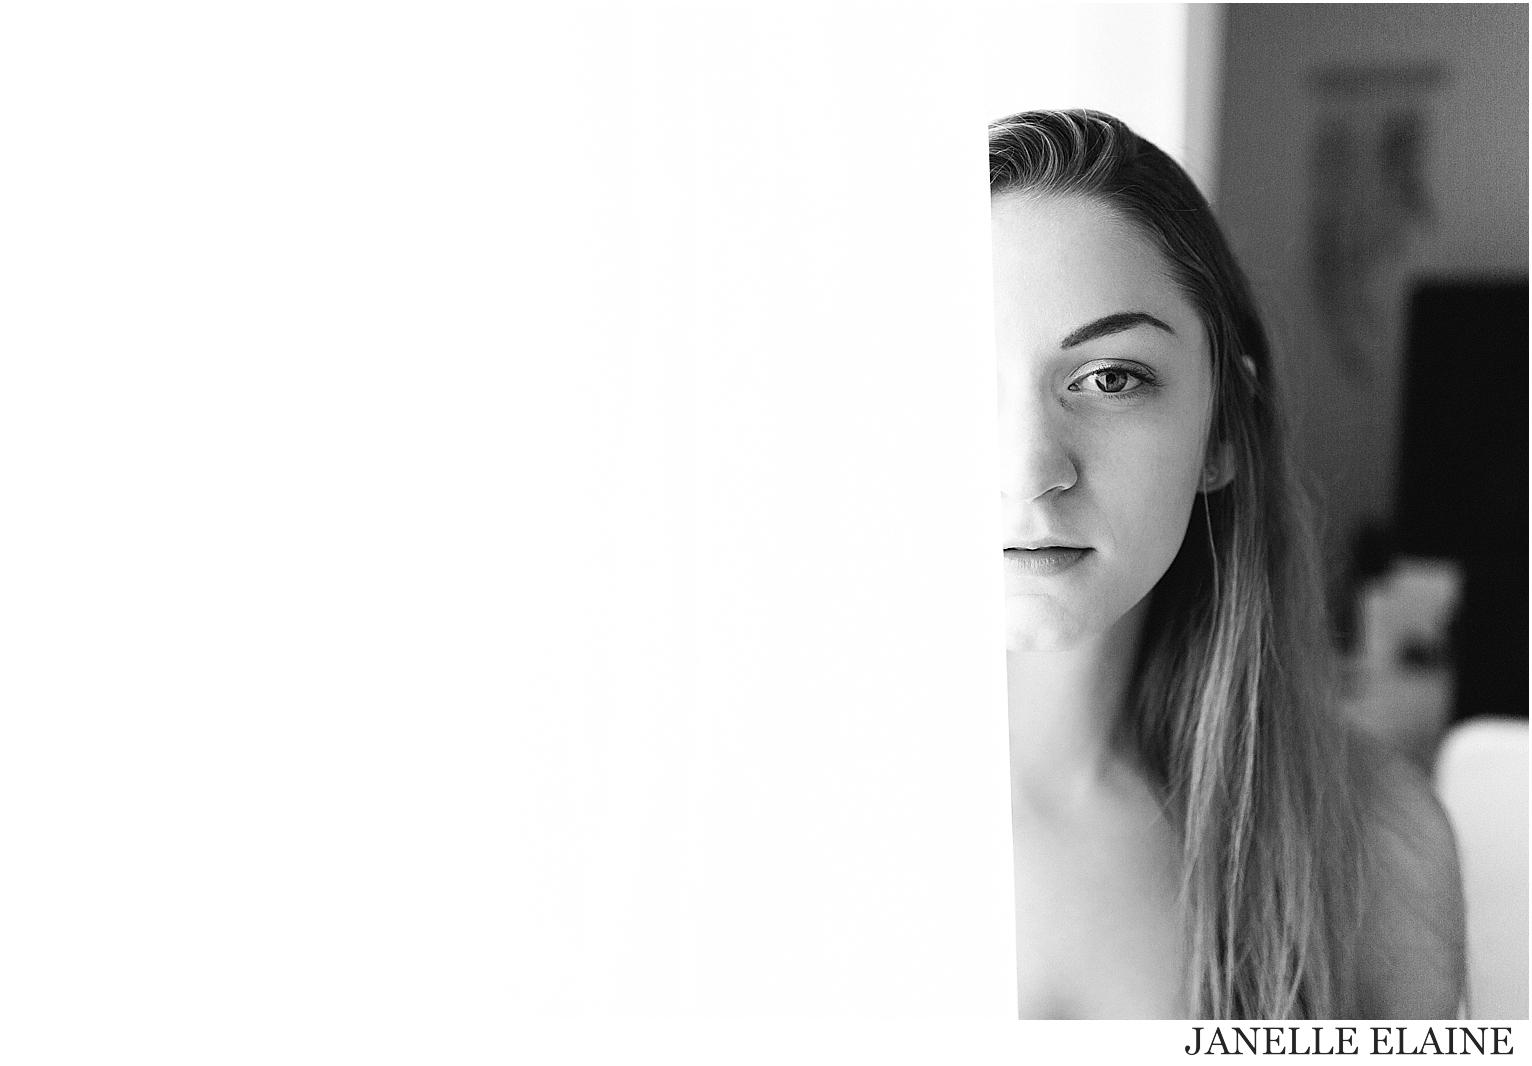 kirsi-seattle-wa-portrait photography-janelle elaine photography-78.jpg